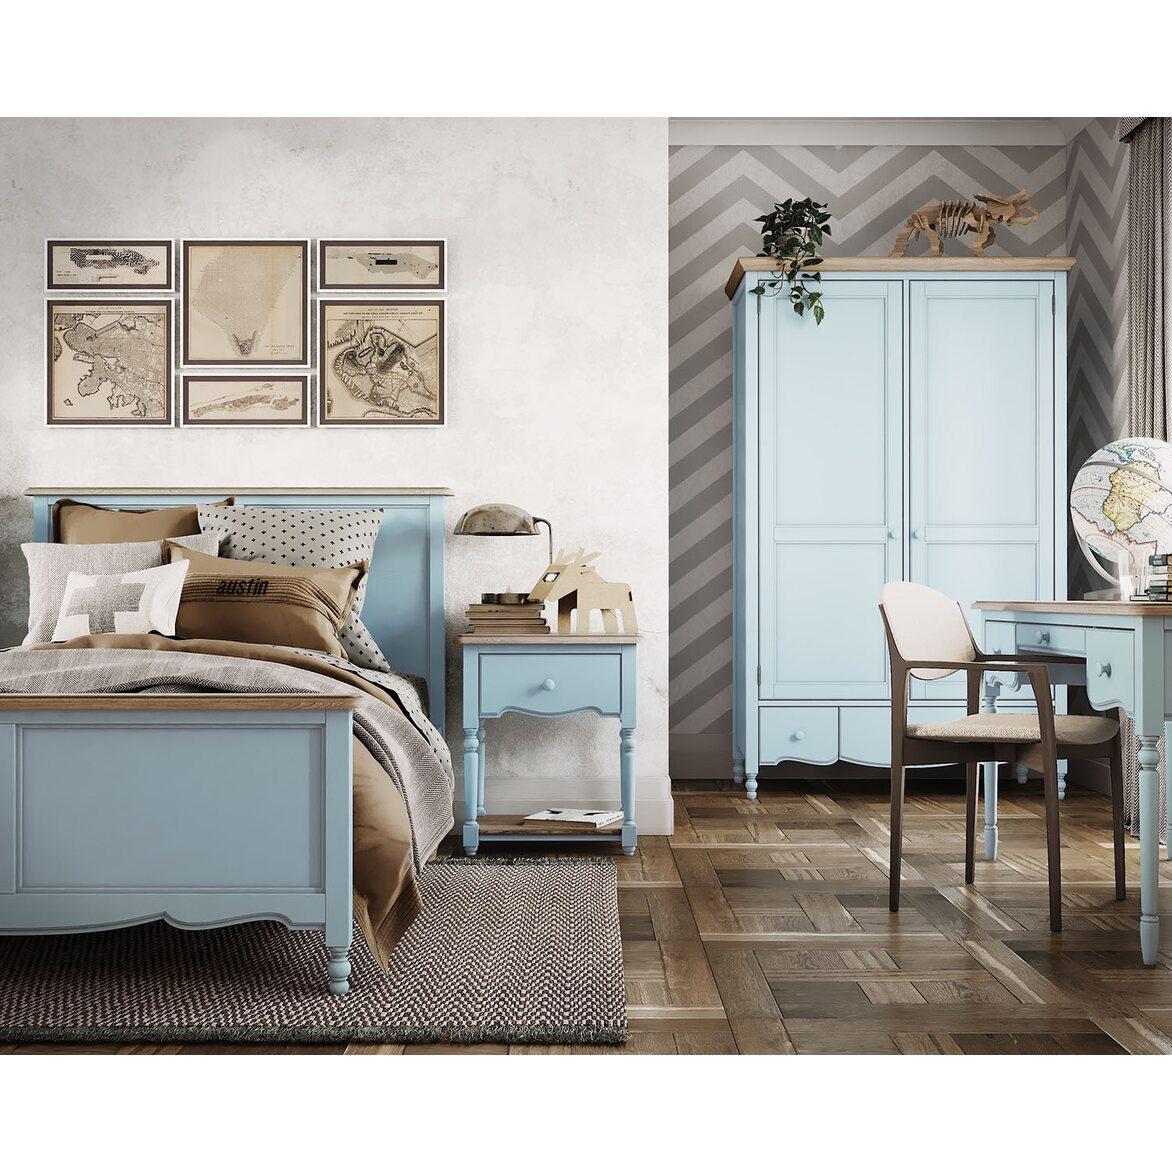 Шкаф двухстворчатый Leblanc, голубой 5 | Платяные шкафы Kingsby